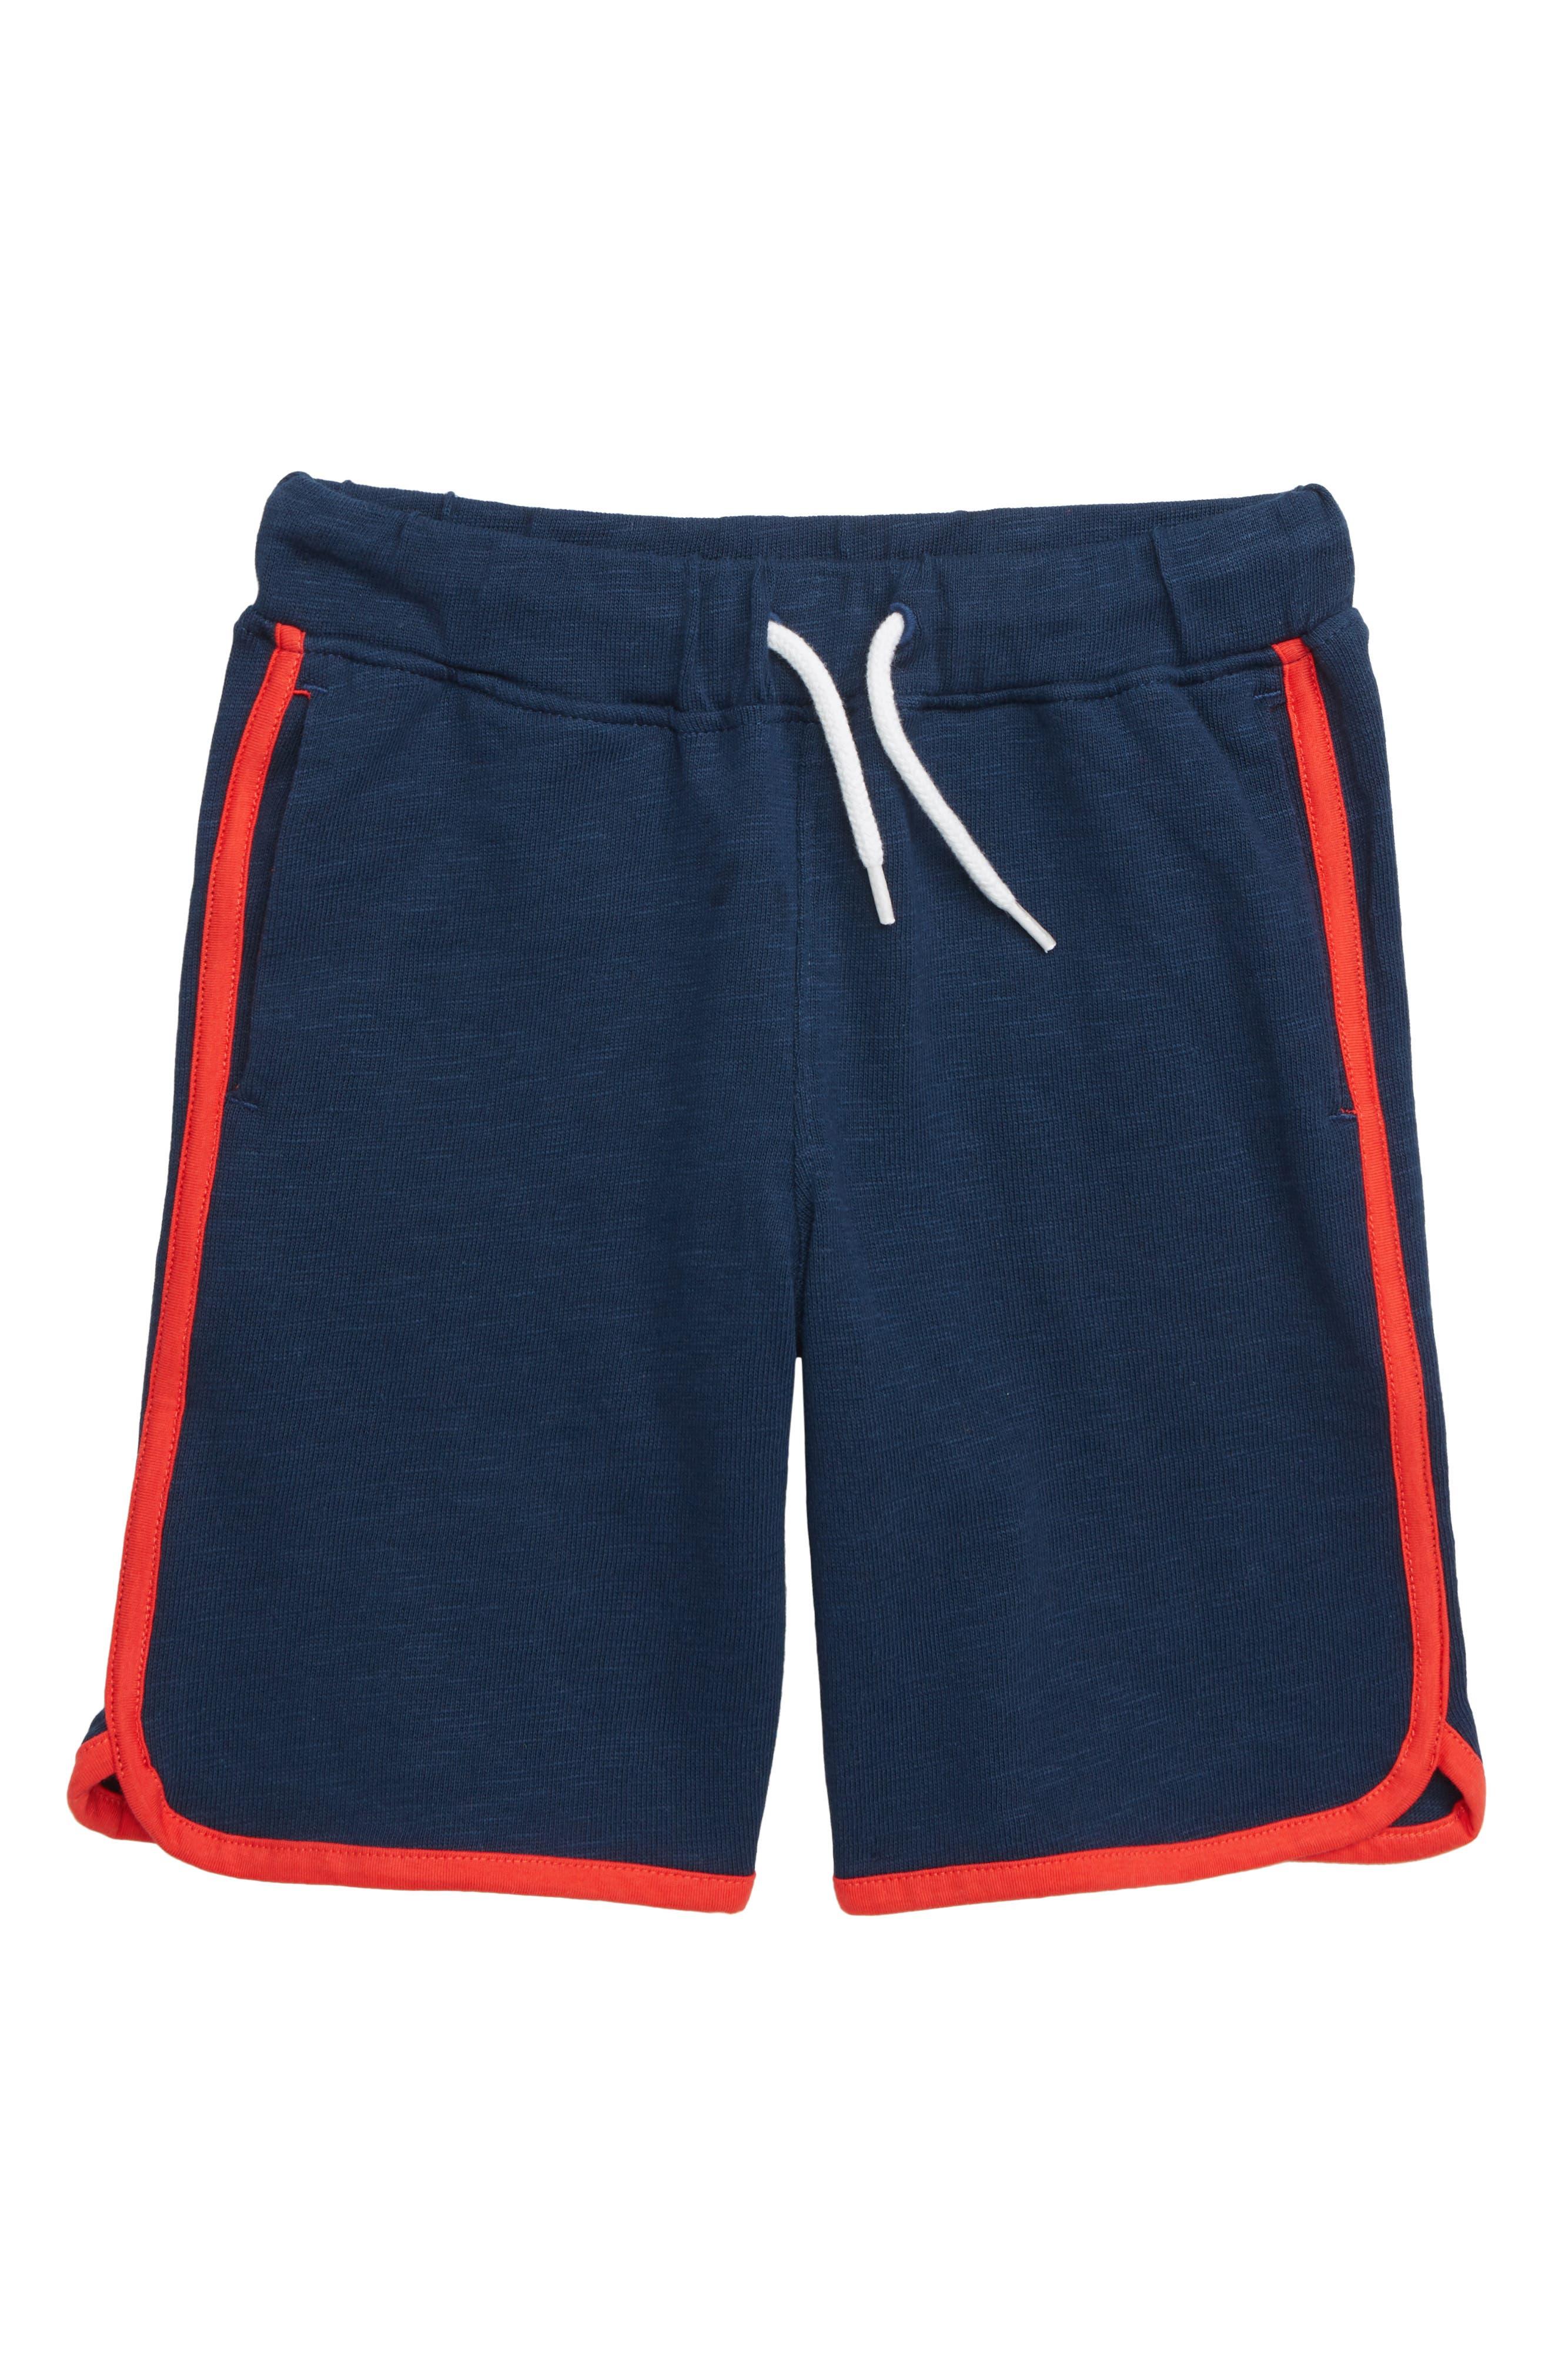 HATLEY Athletic Shorts, Main, color, BLUE